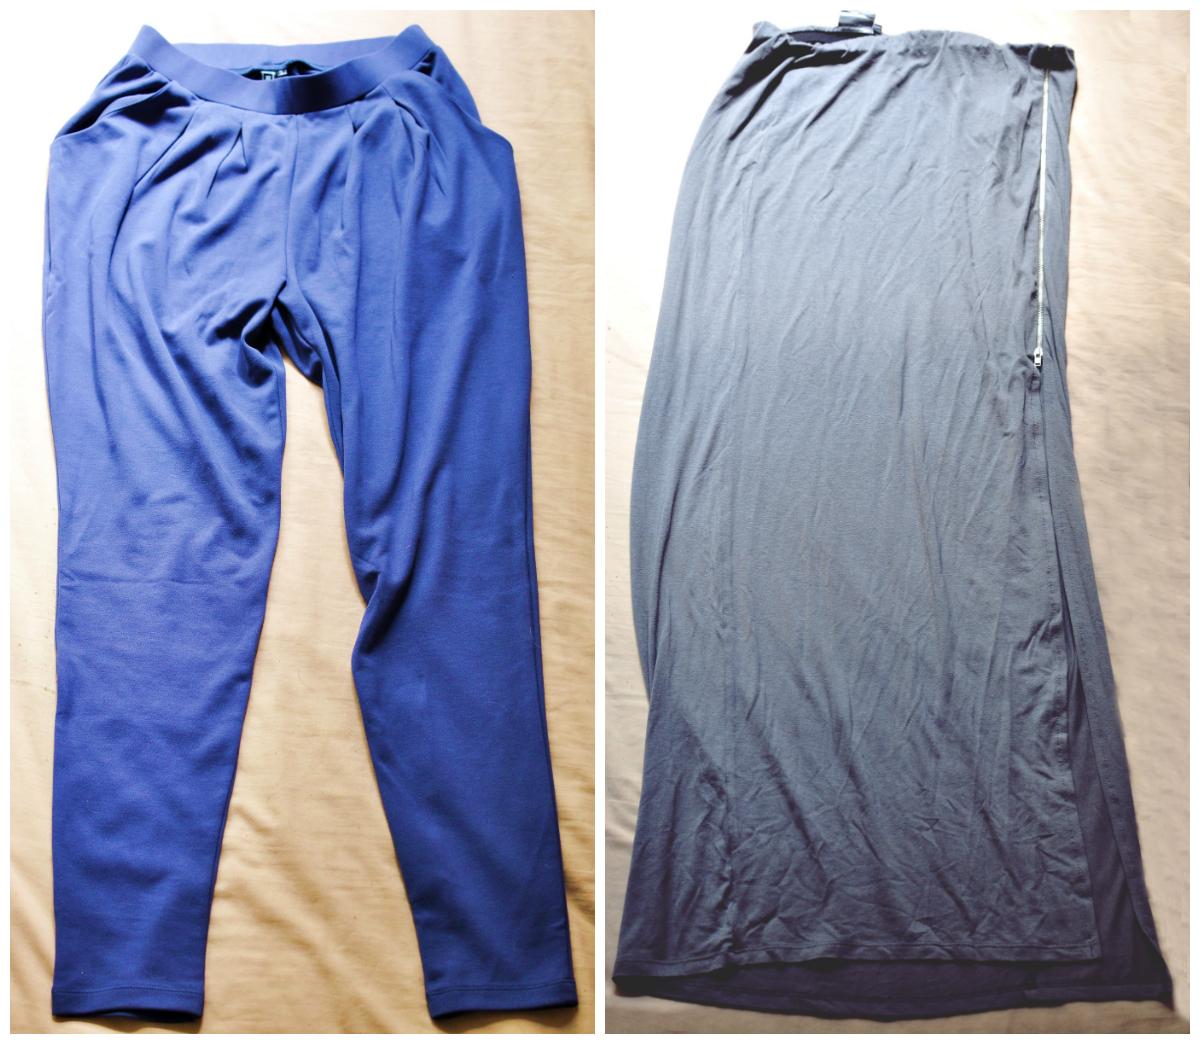 spodnica-czy-spodnie